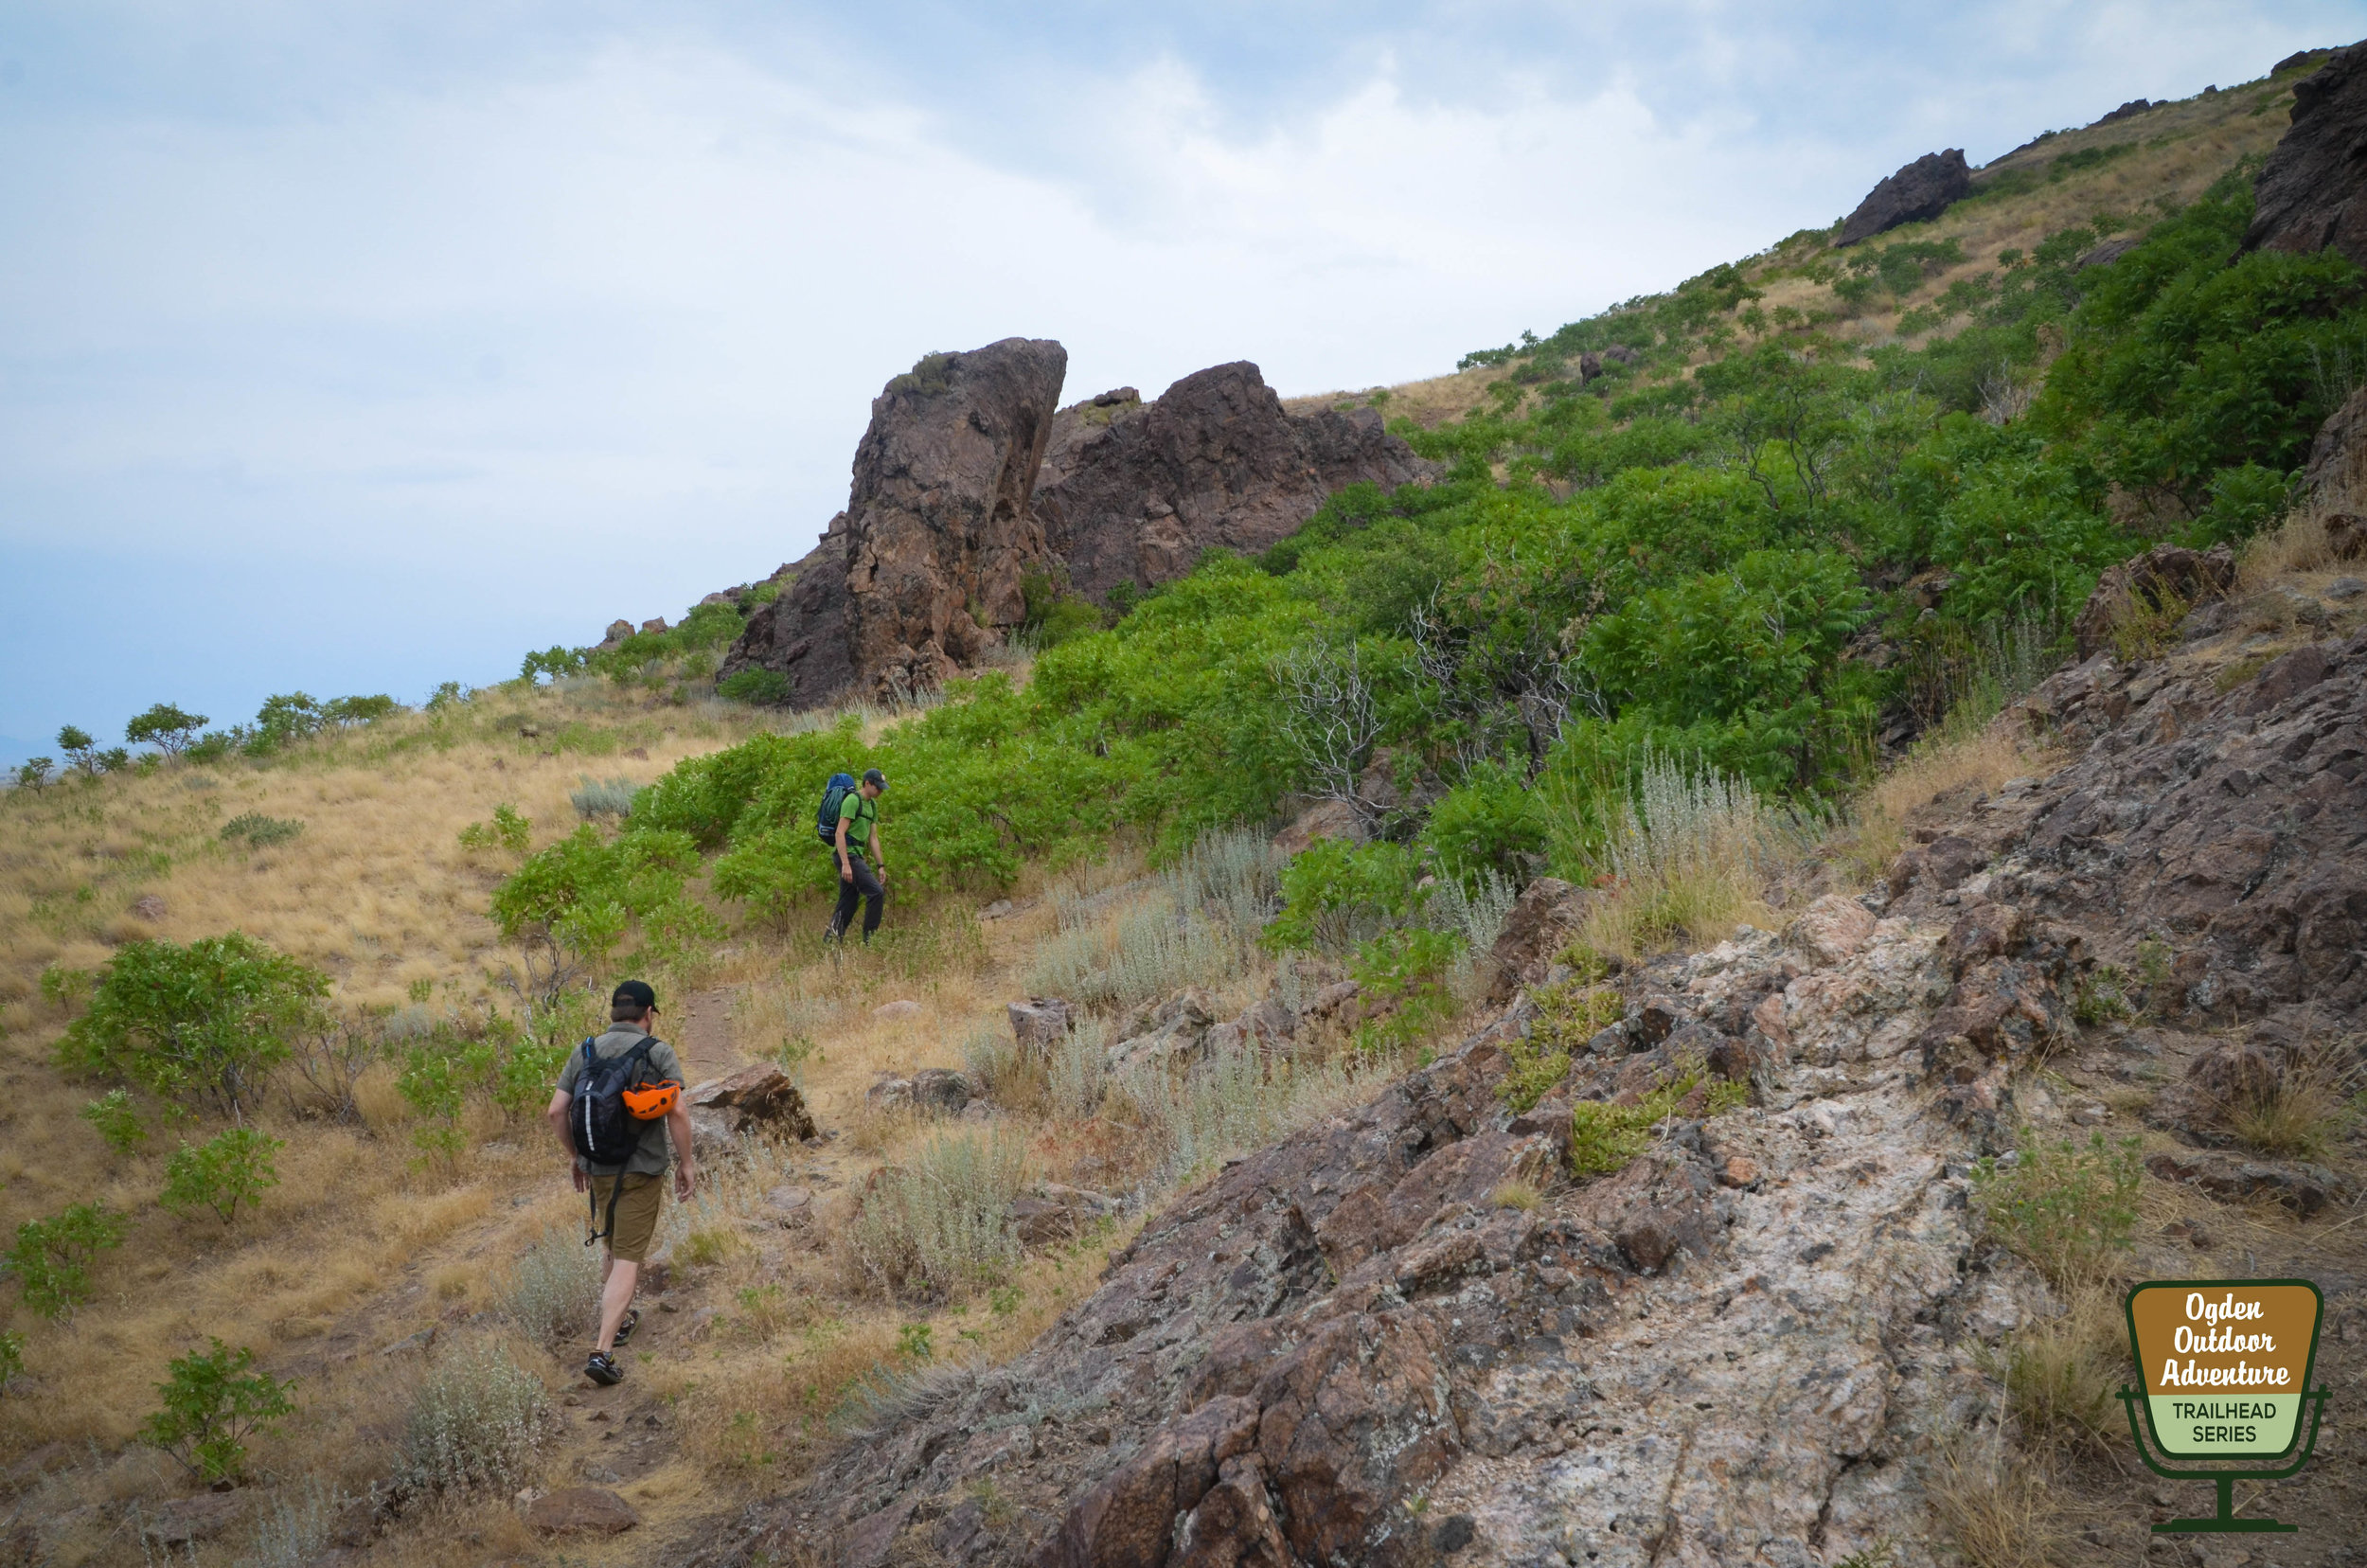 Ogden Outdoor Adventure Show 248 - Bear House Mountaineering-1.jpg